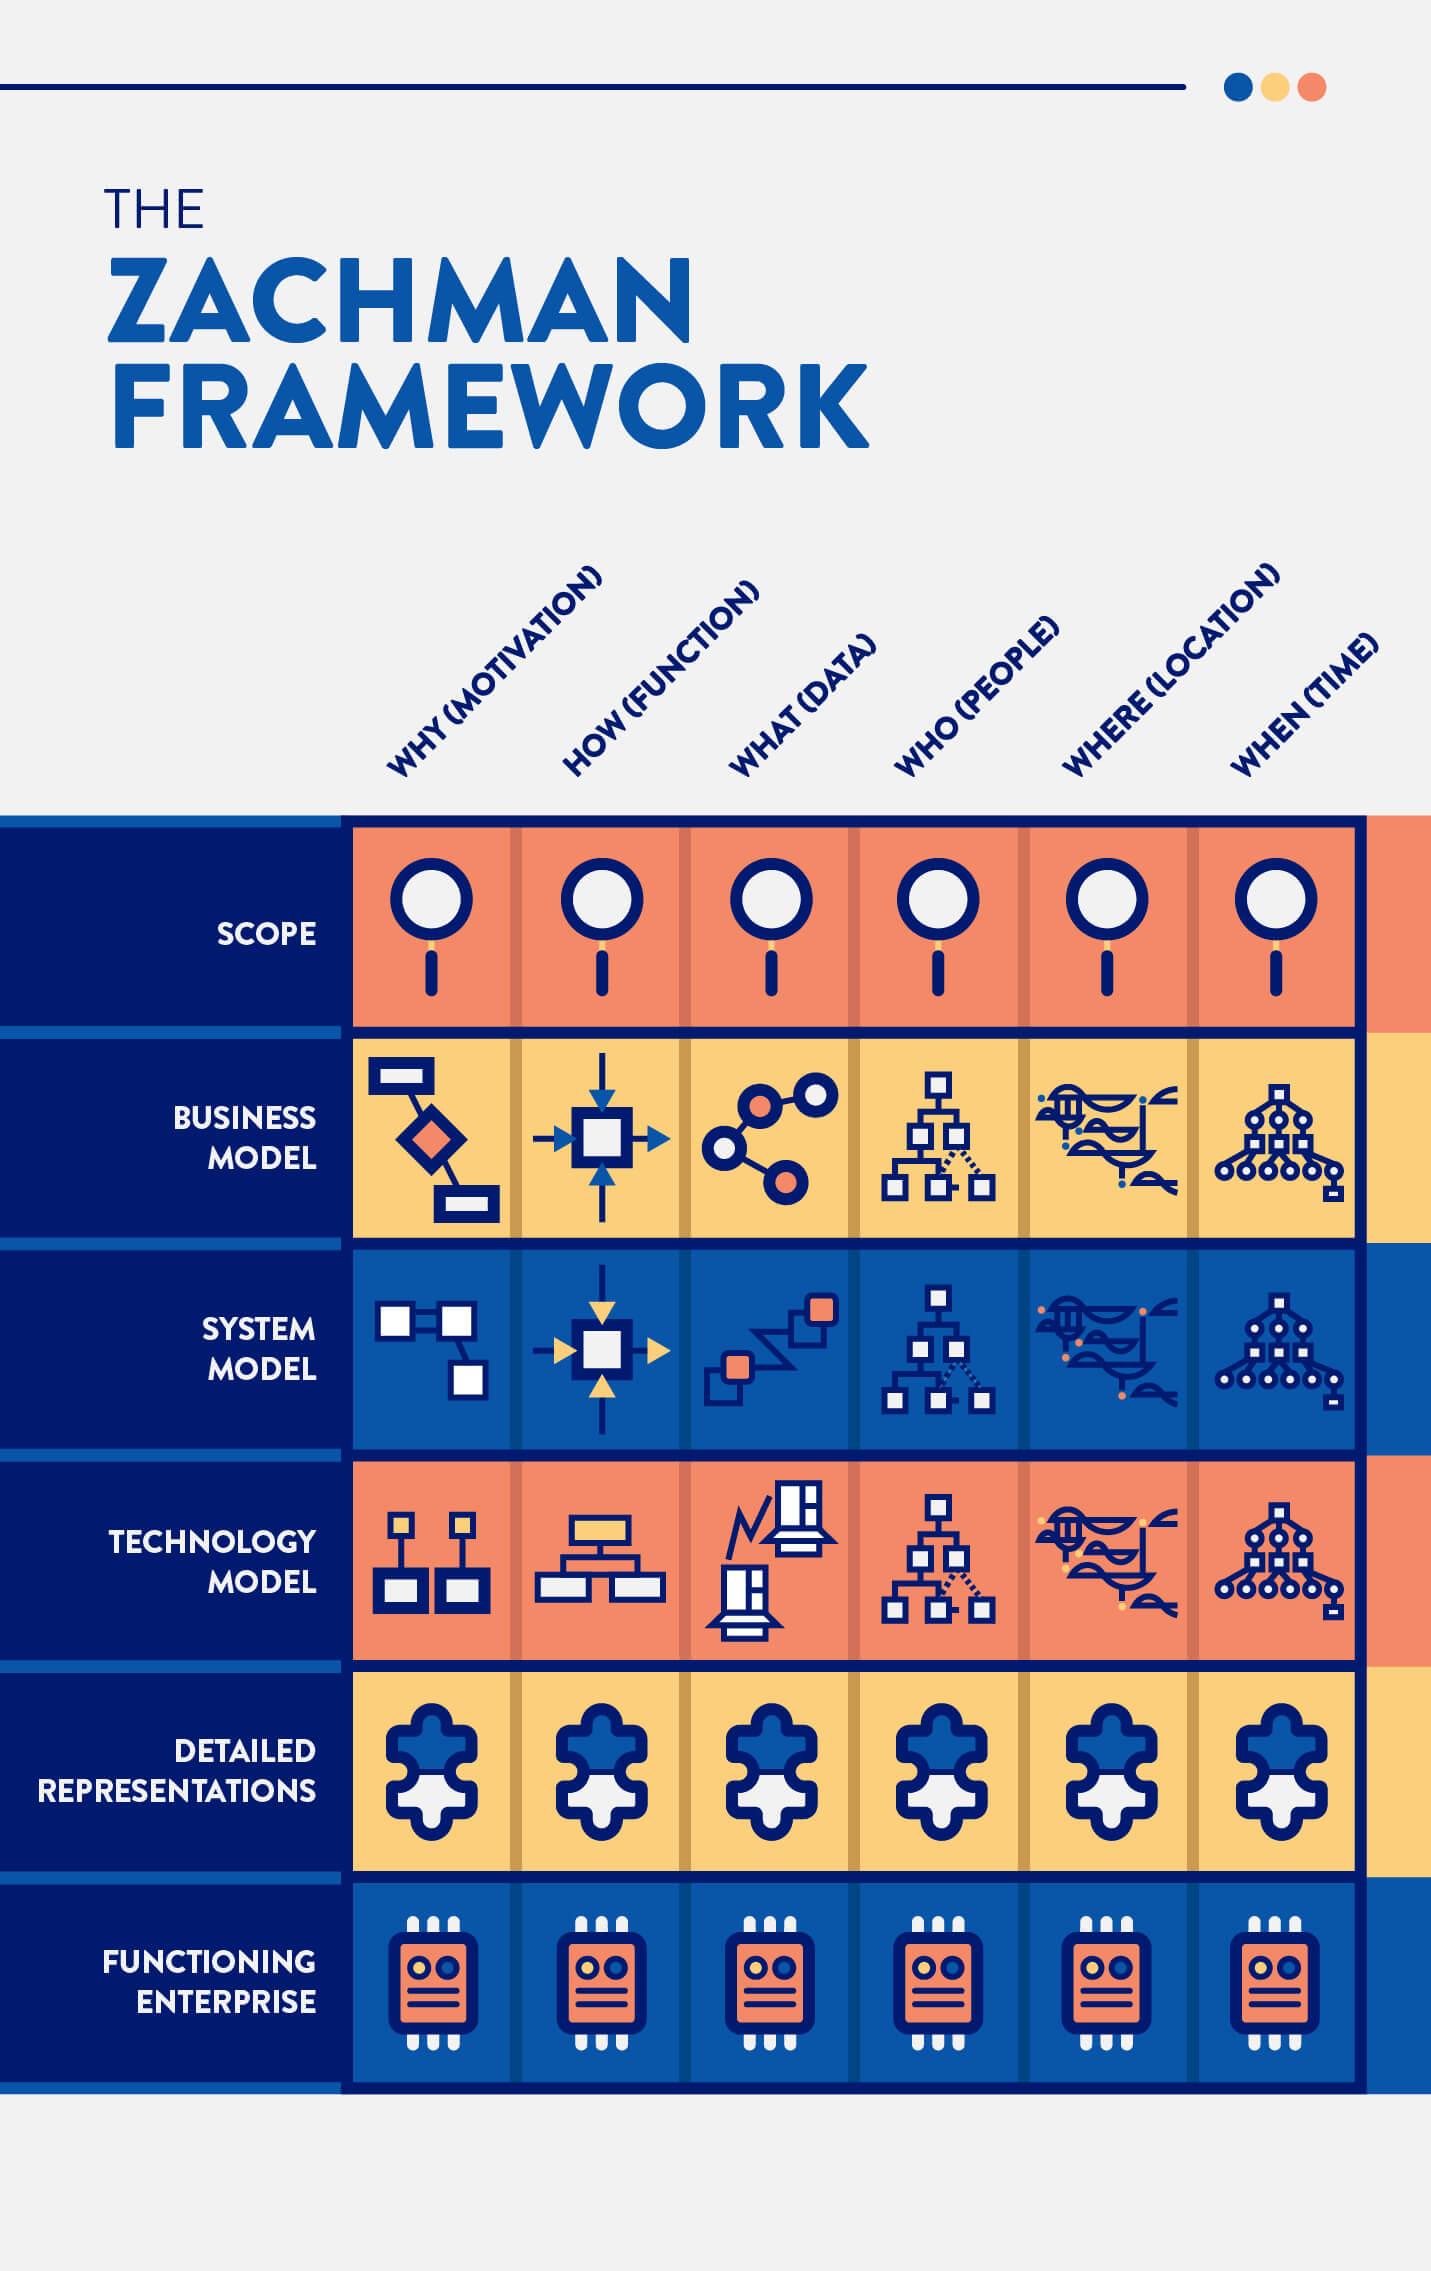 zachman framework diagram for enterprise architecture planning